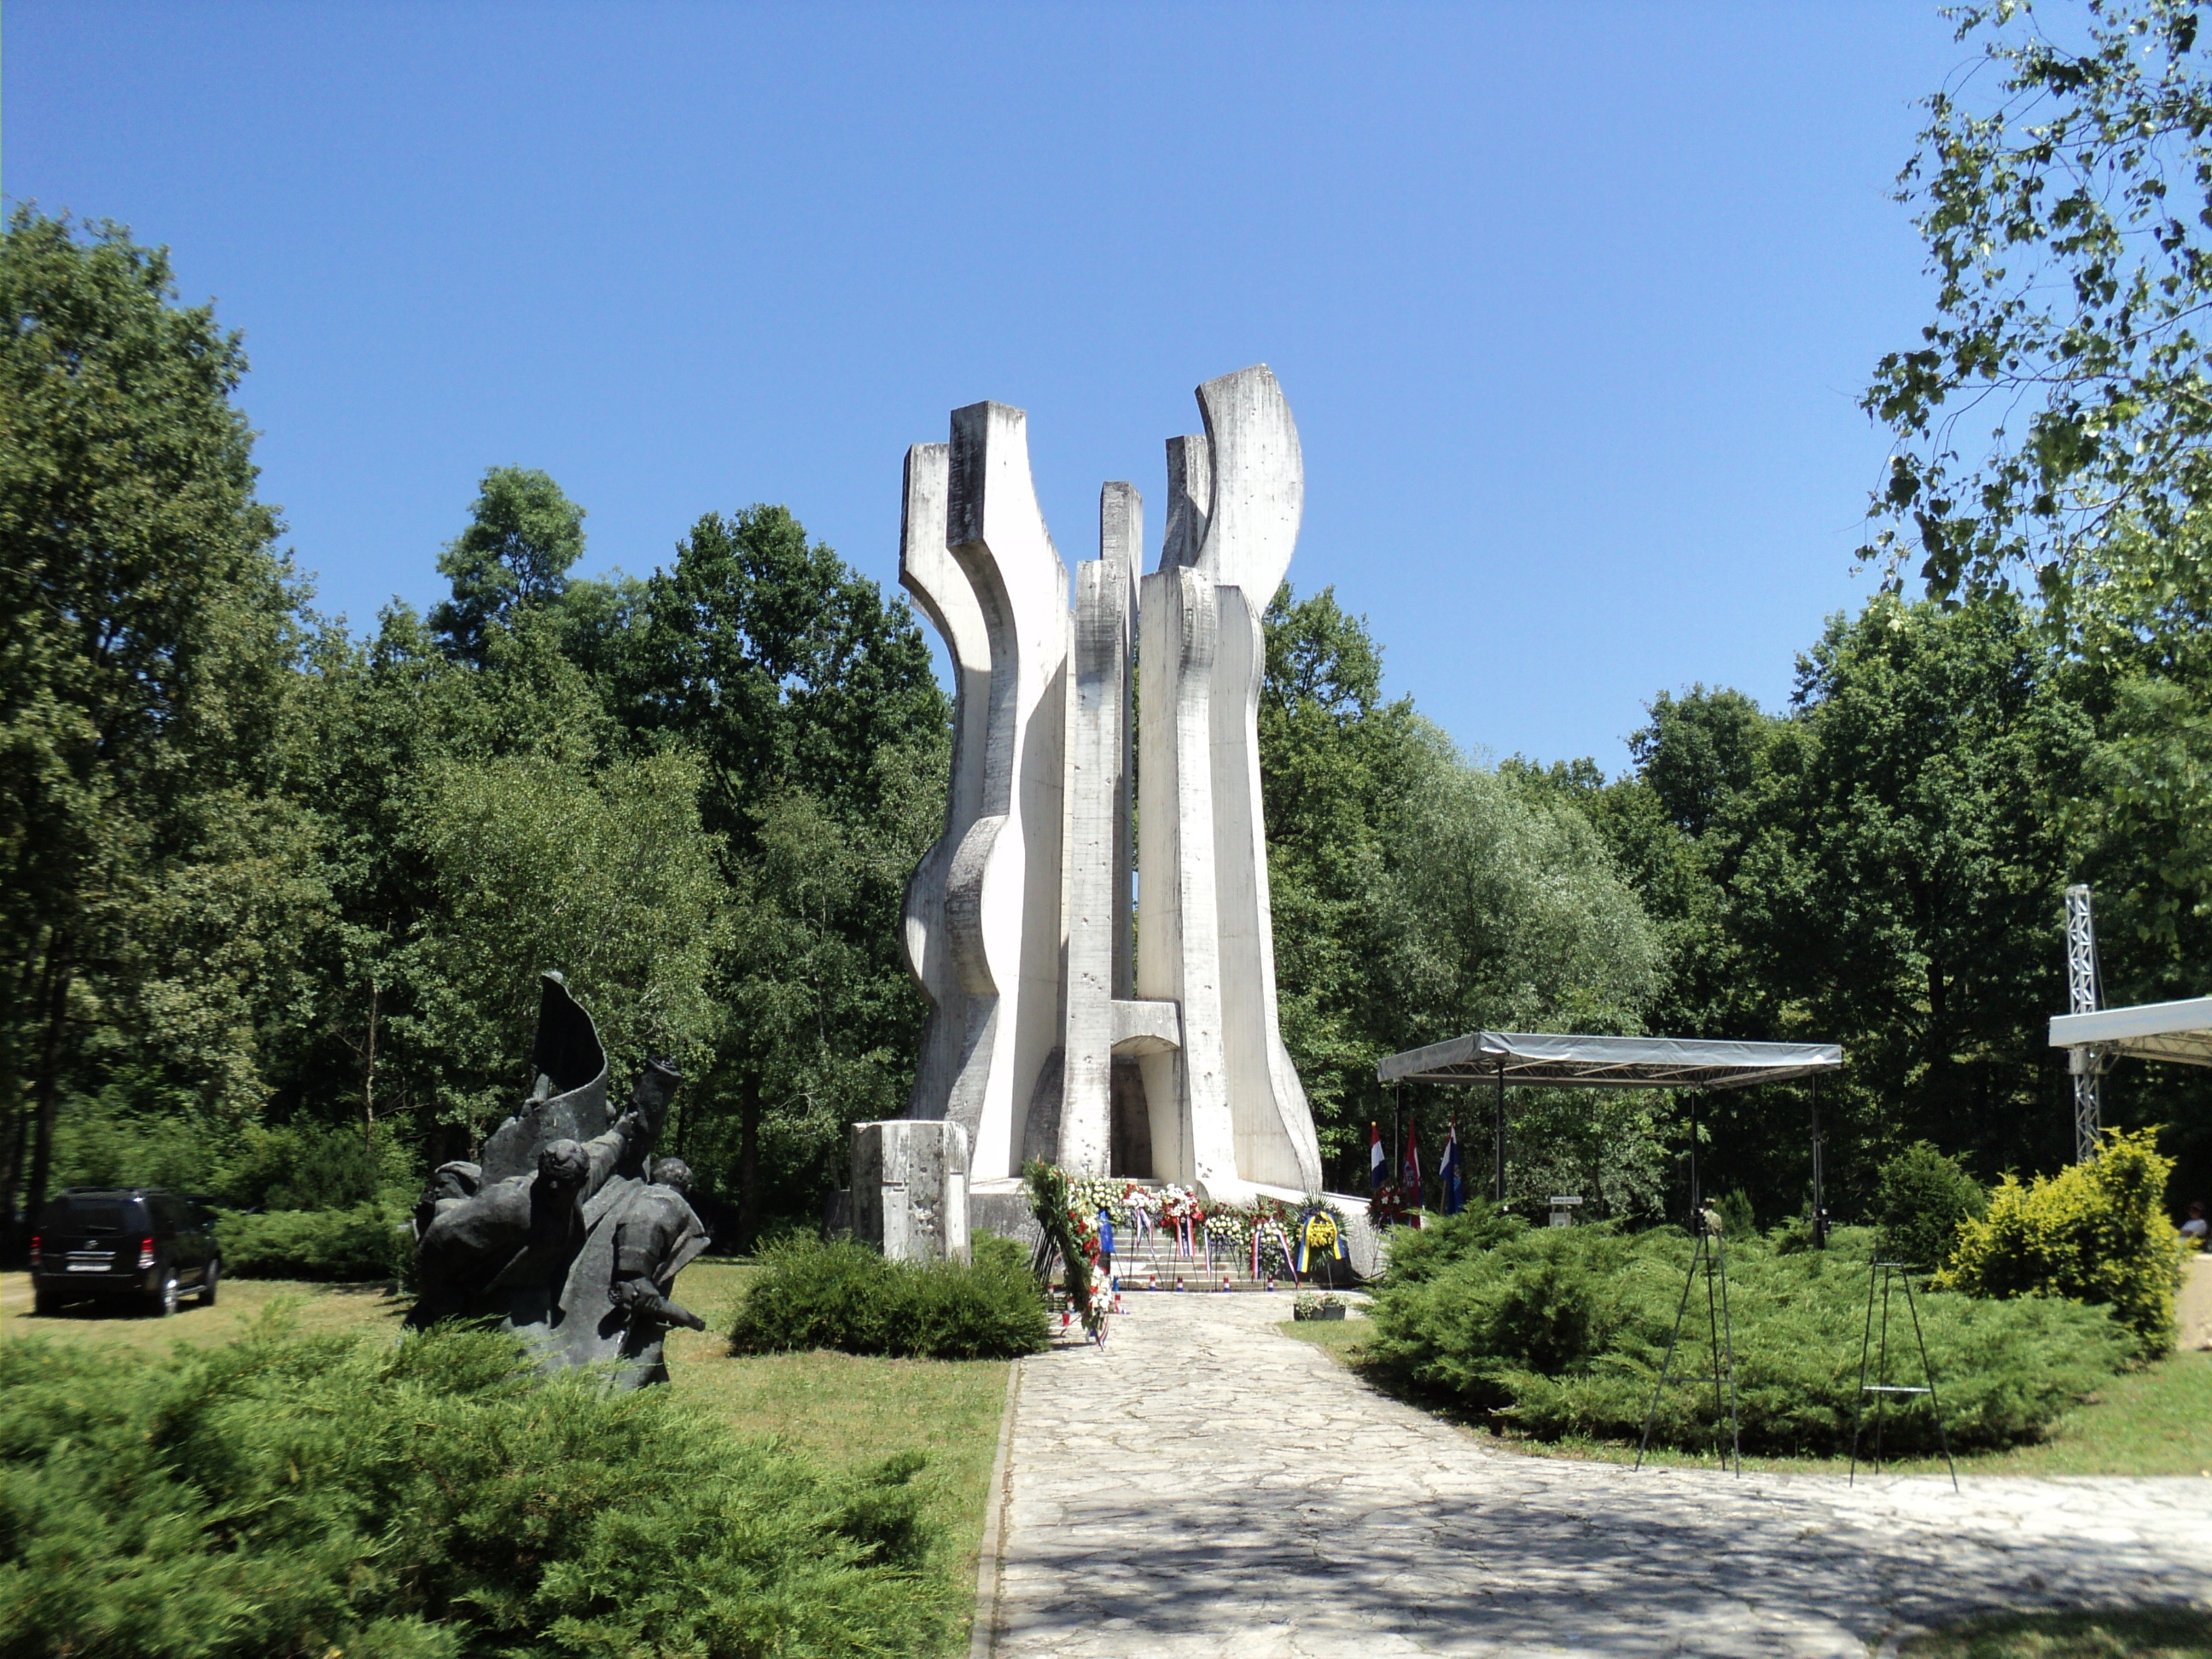 Spomen park Brezovica. Izvor: https://hr.wikipedia.org/wiki/Spomen-park_Brezovica